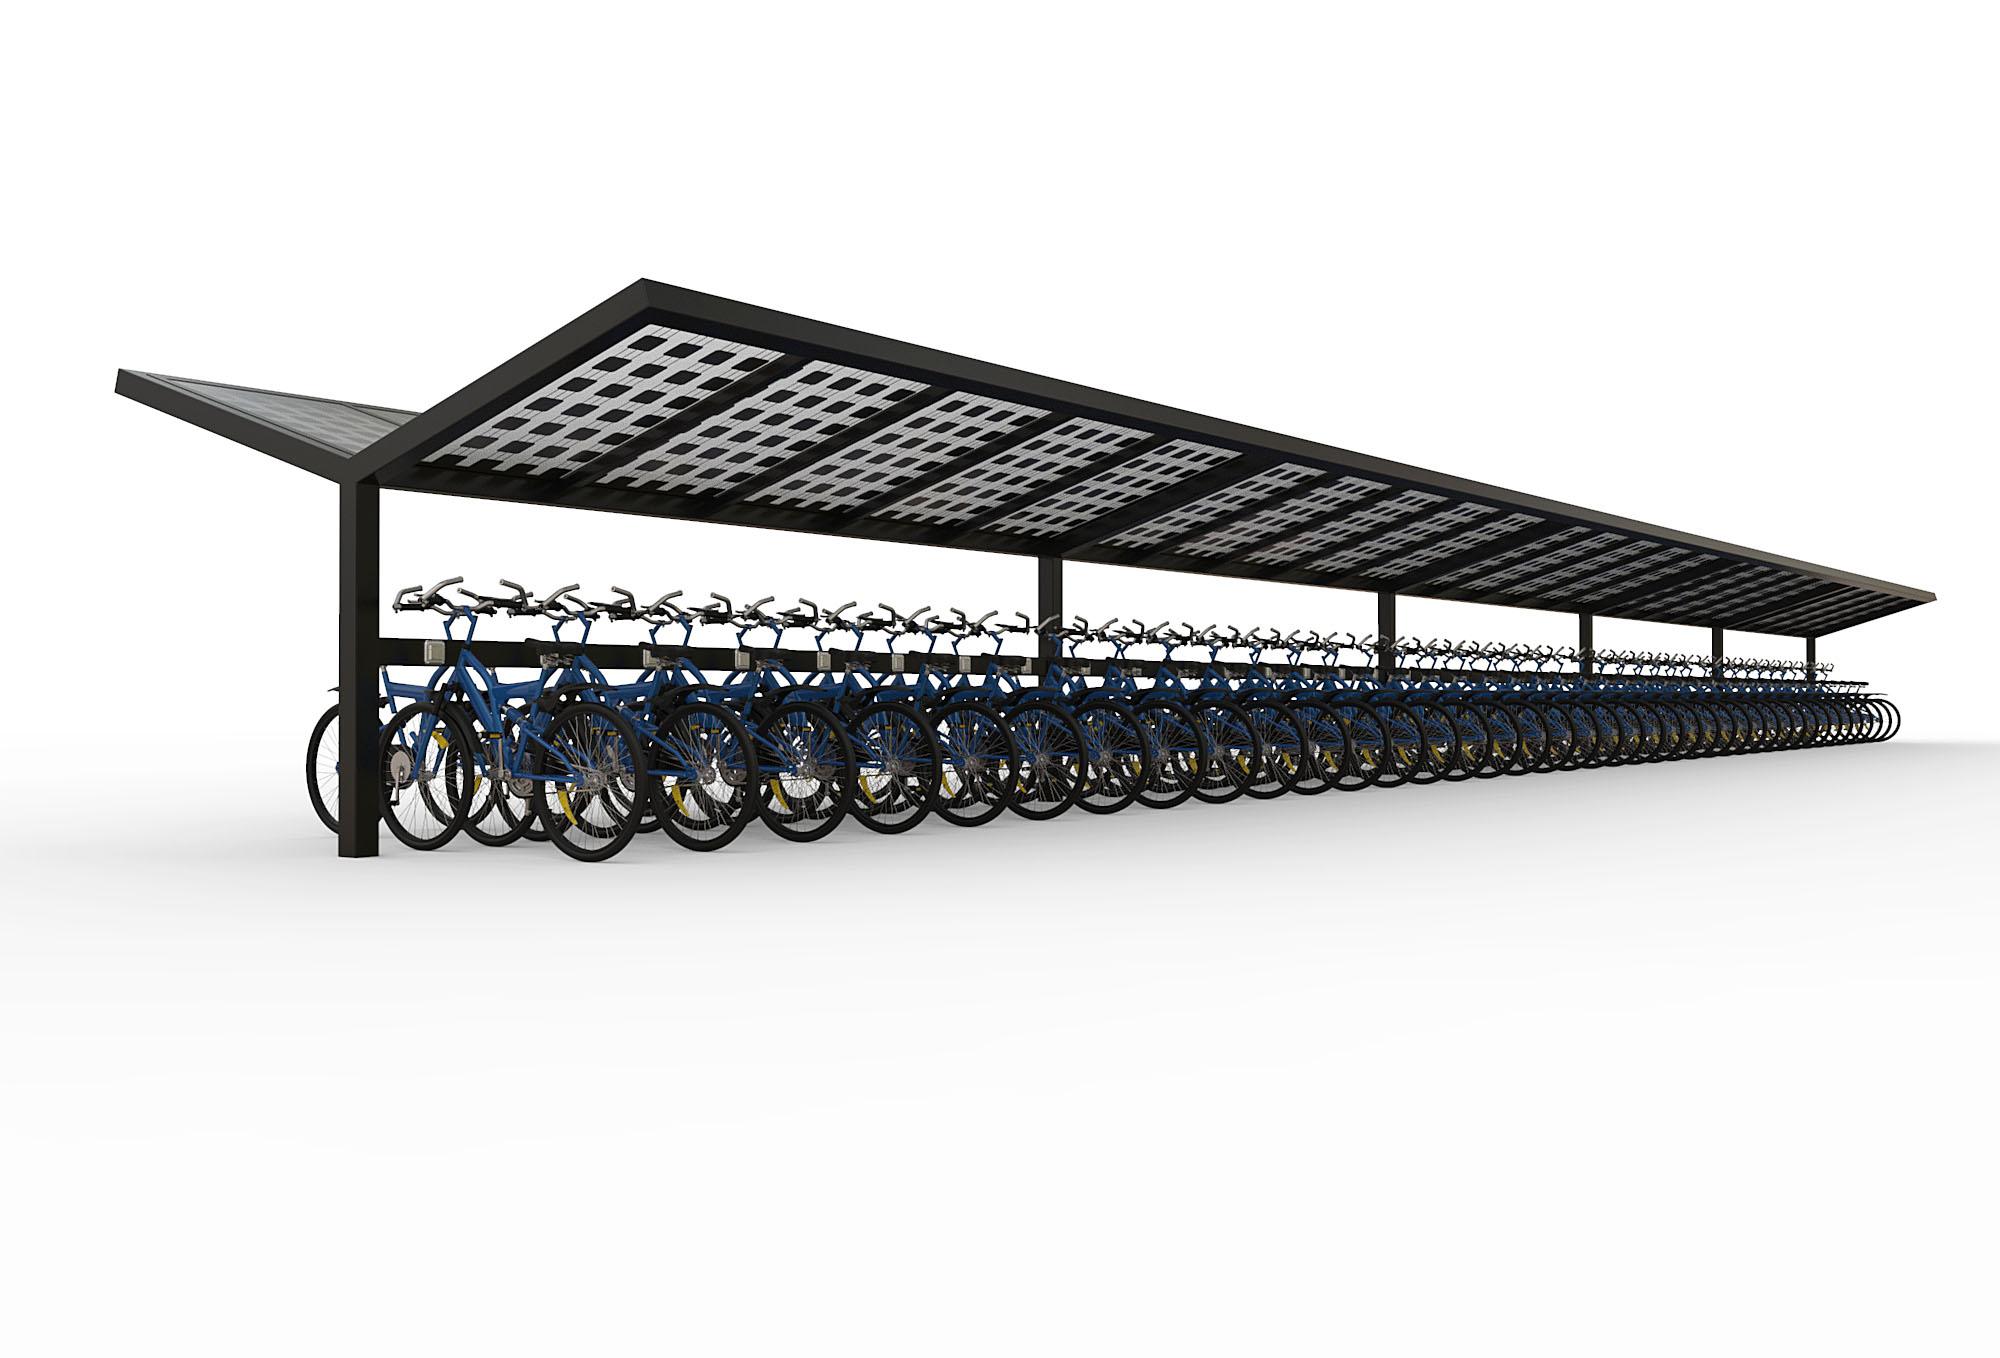 Solar fietsenstalling 20 meter